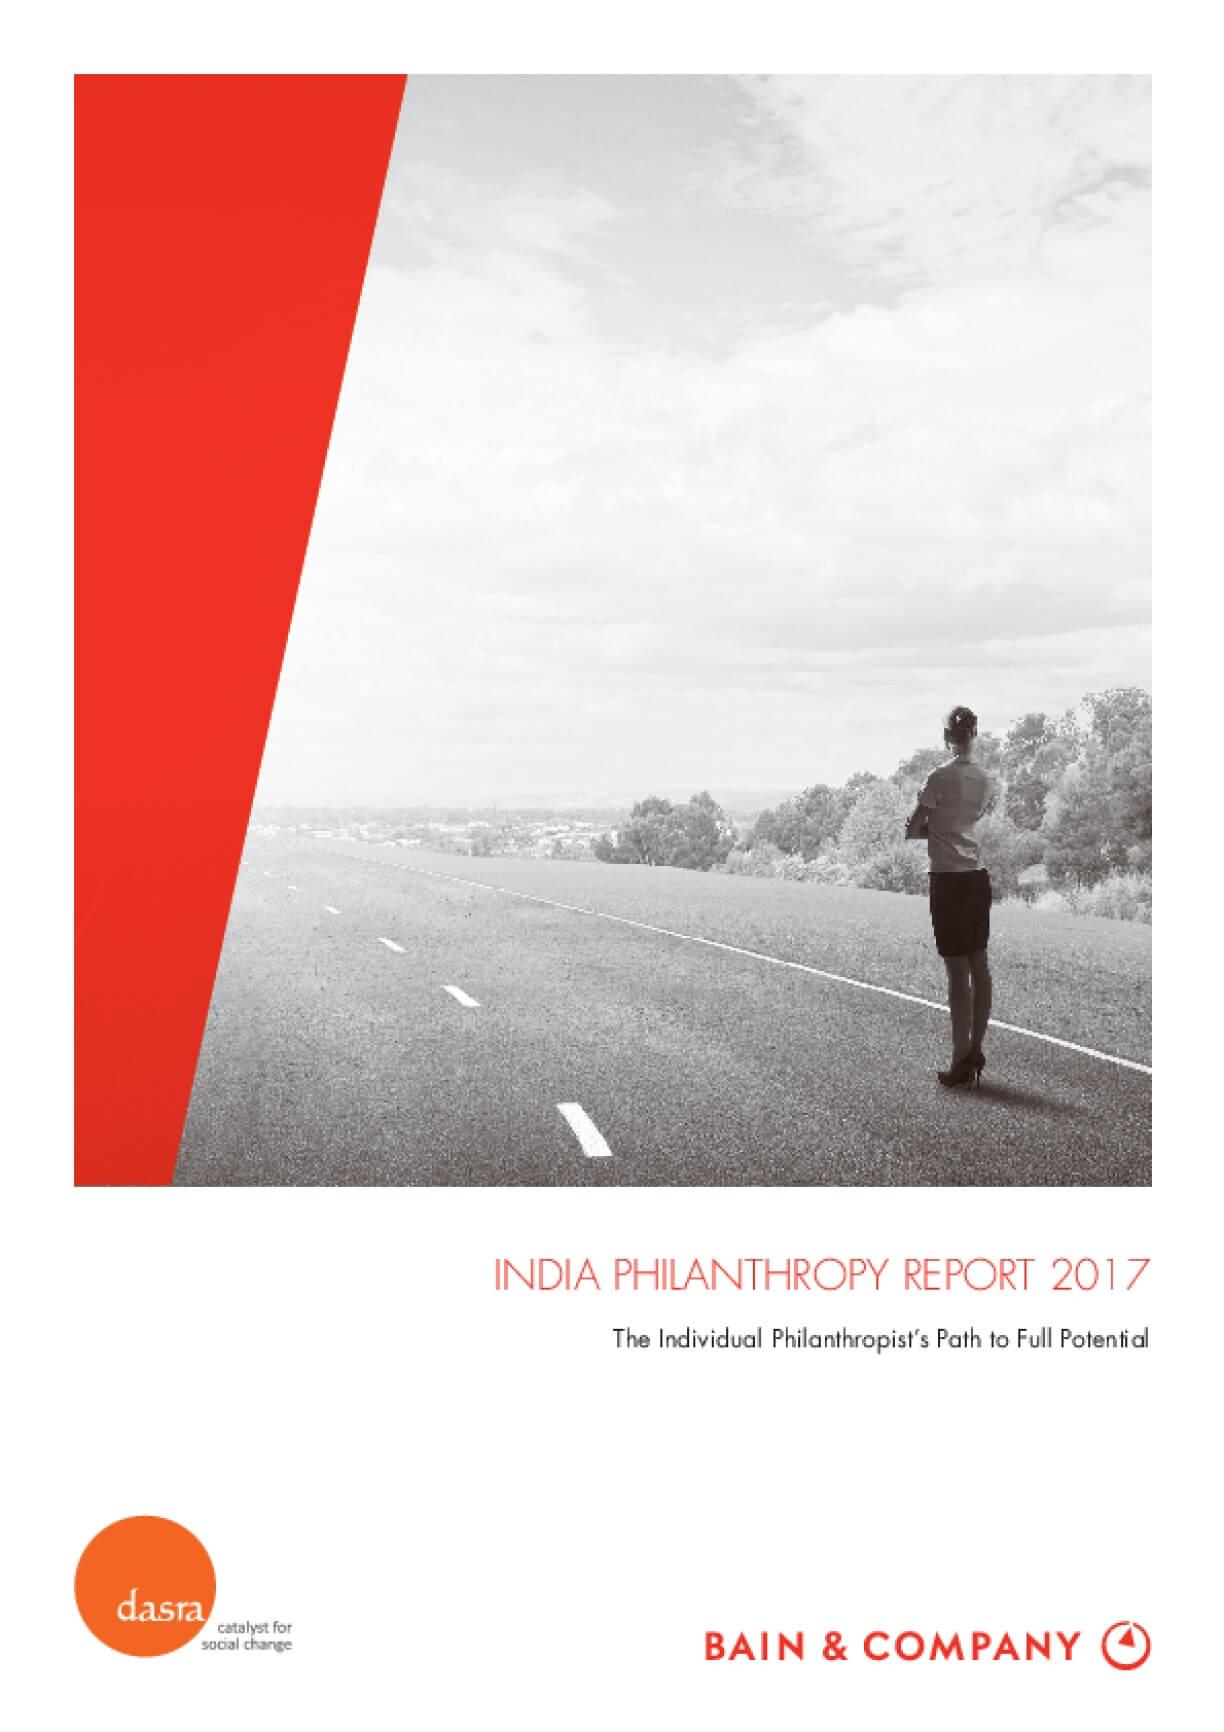 India Philanthropy Report 2017 - The Individual Philanthropist's Path to Full Potential